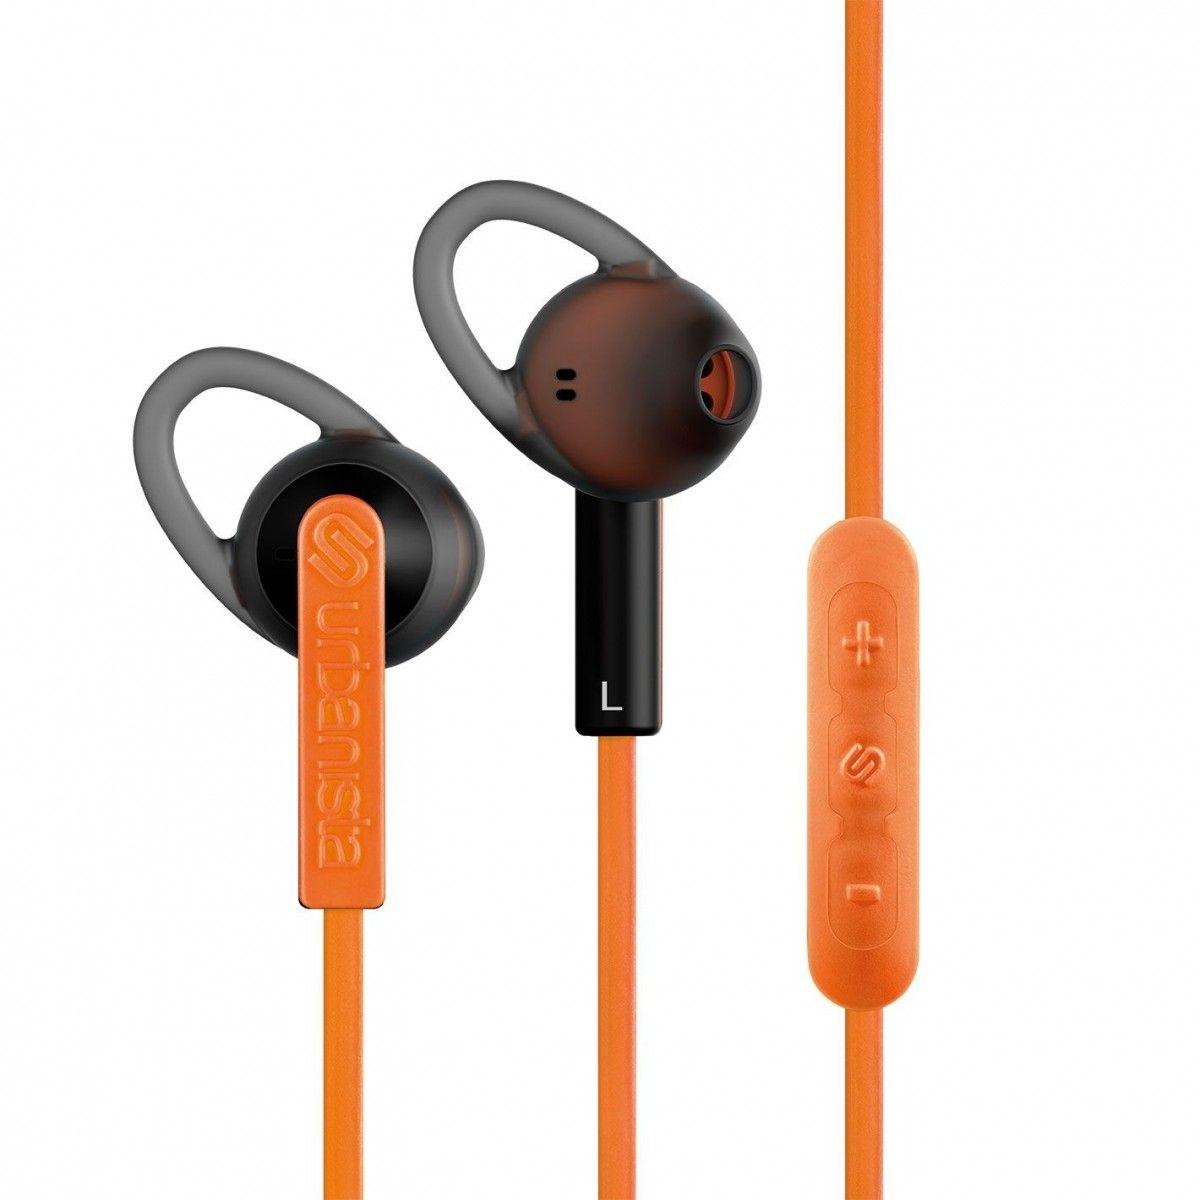 Fone de ouvido Bluetooth Boston Laranja